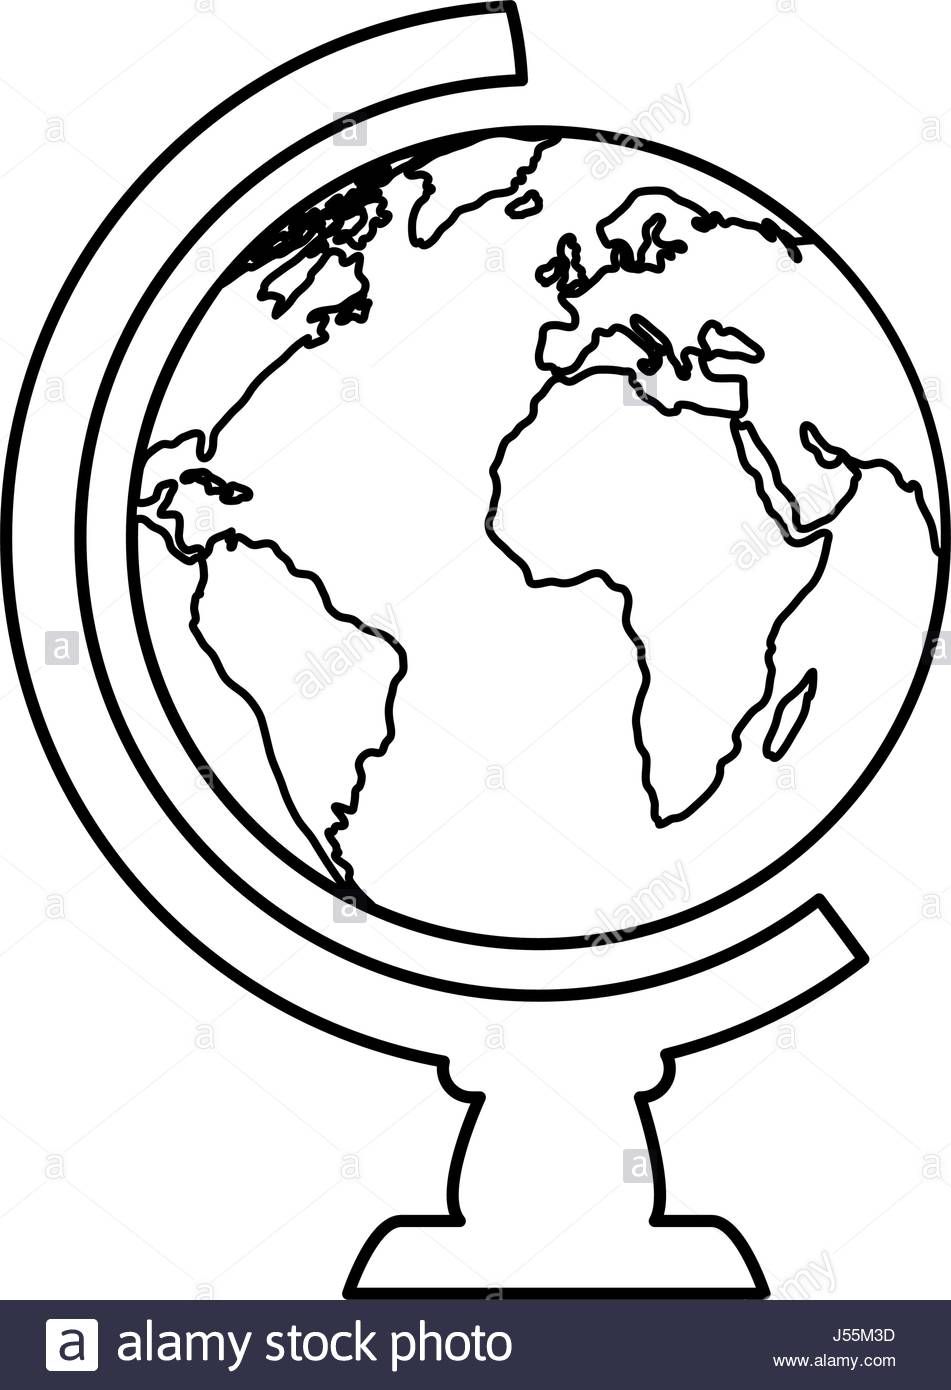 951x1390 World Globe Stock Vector Images